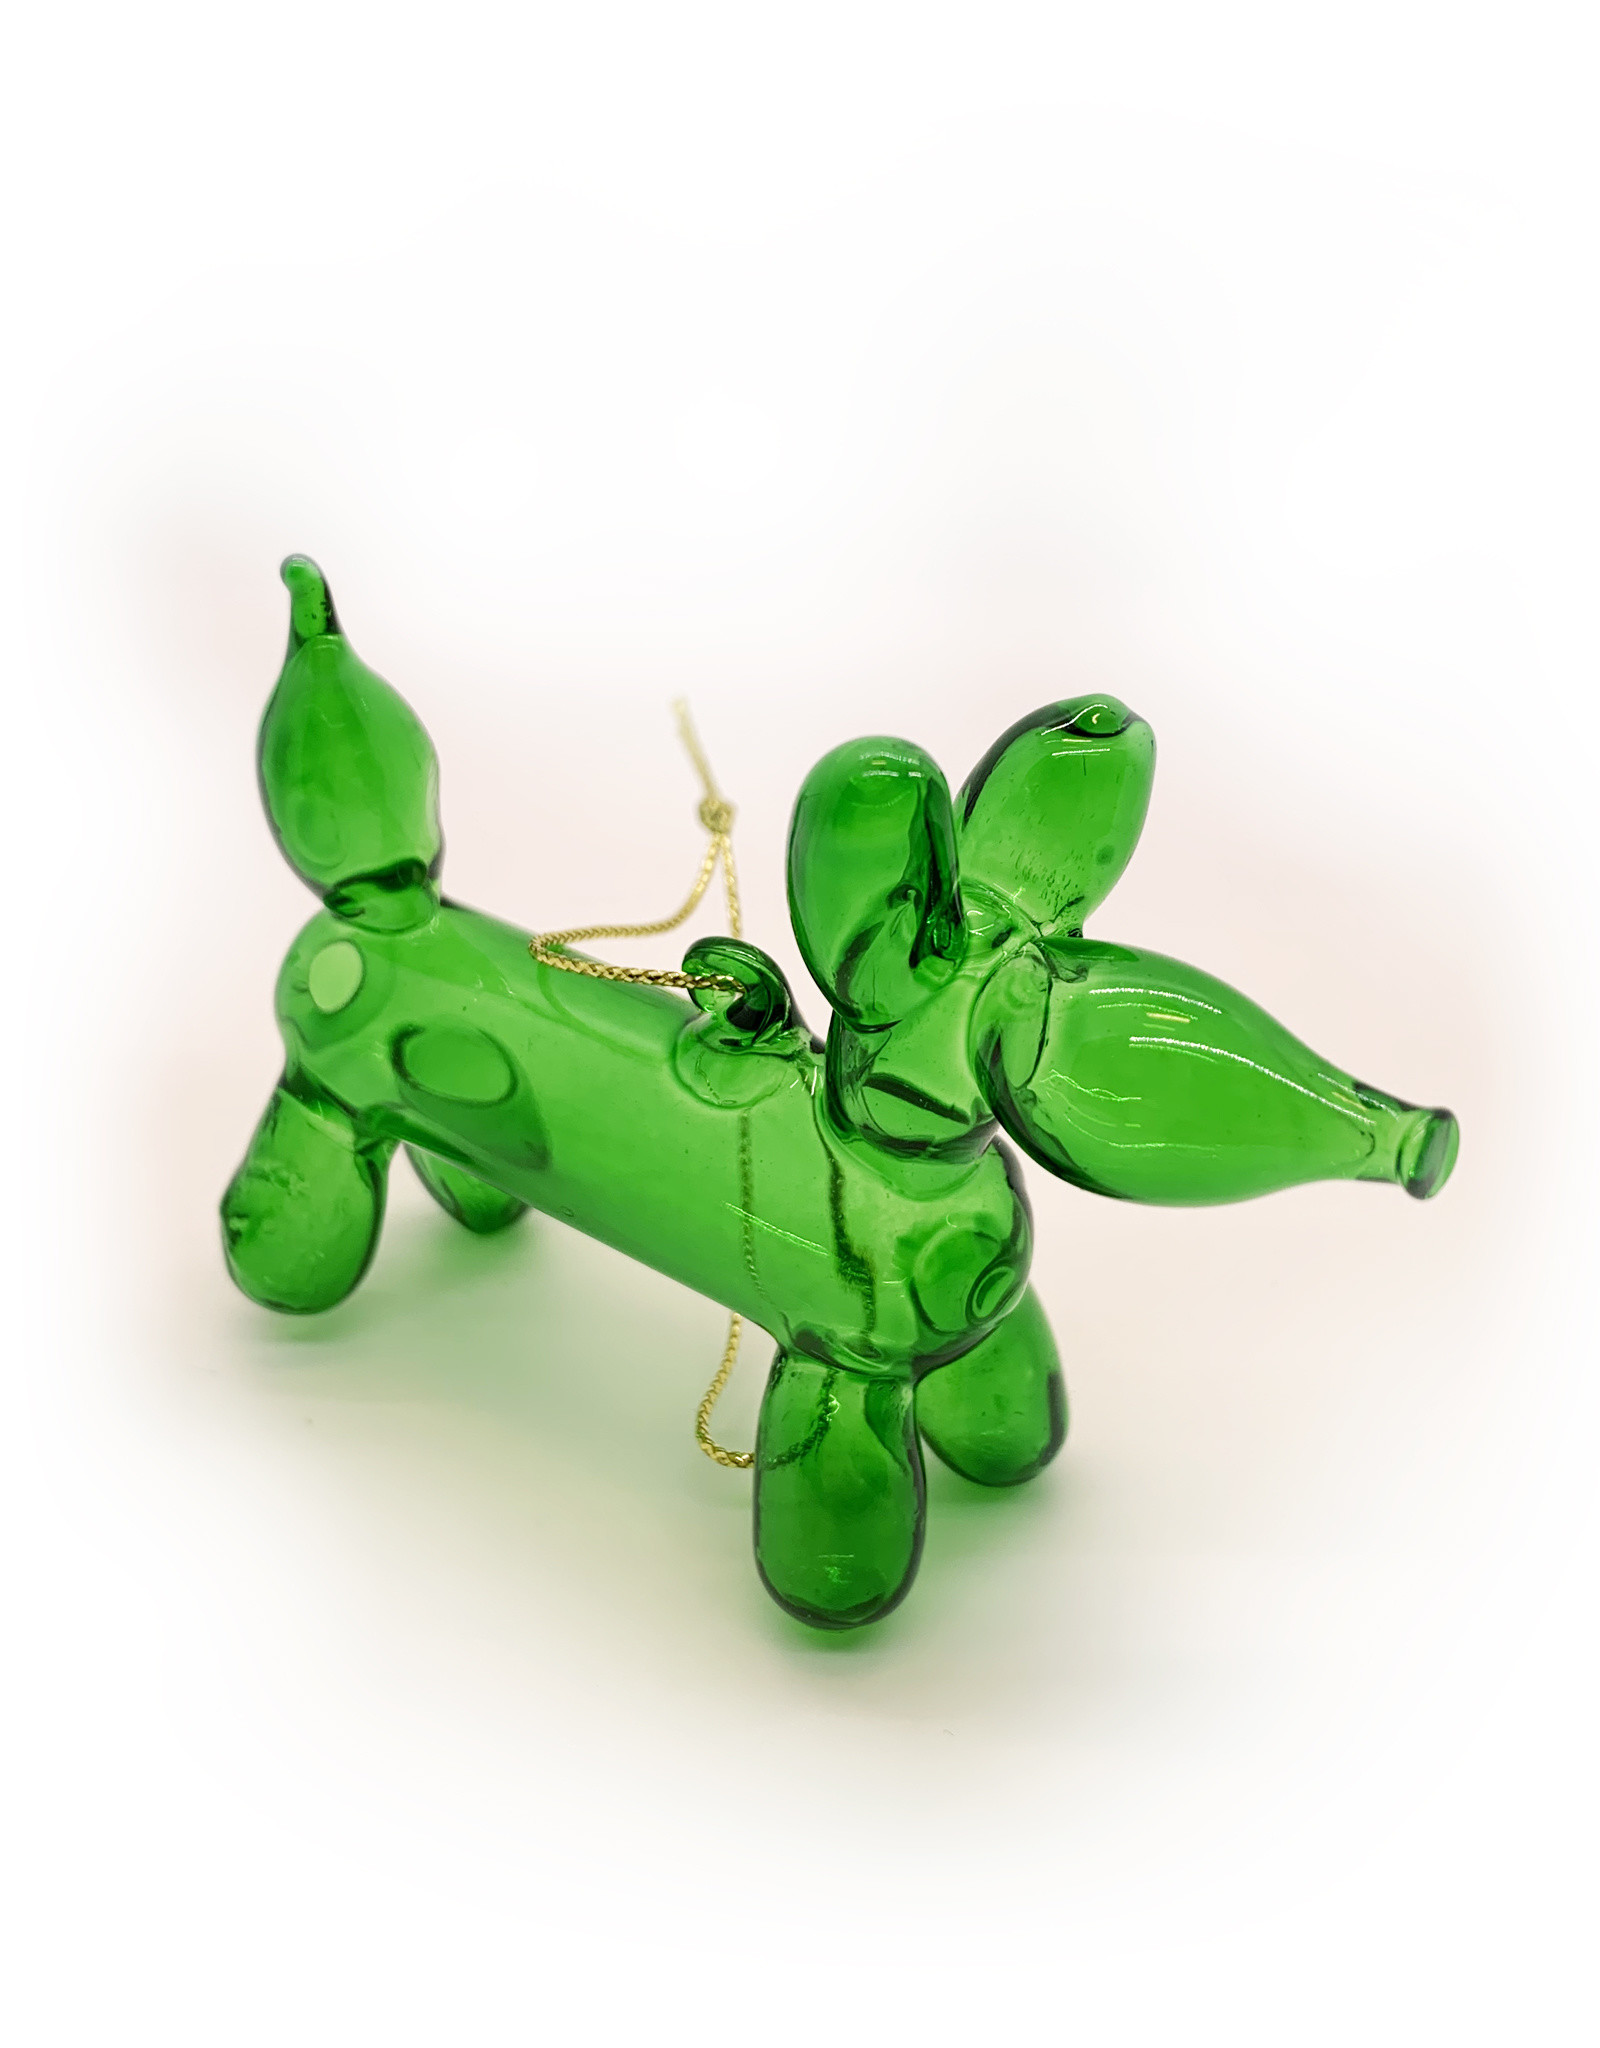 Balloon Dog Ornament